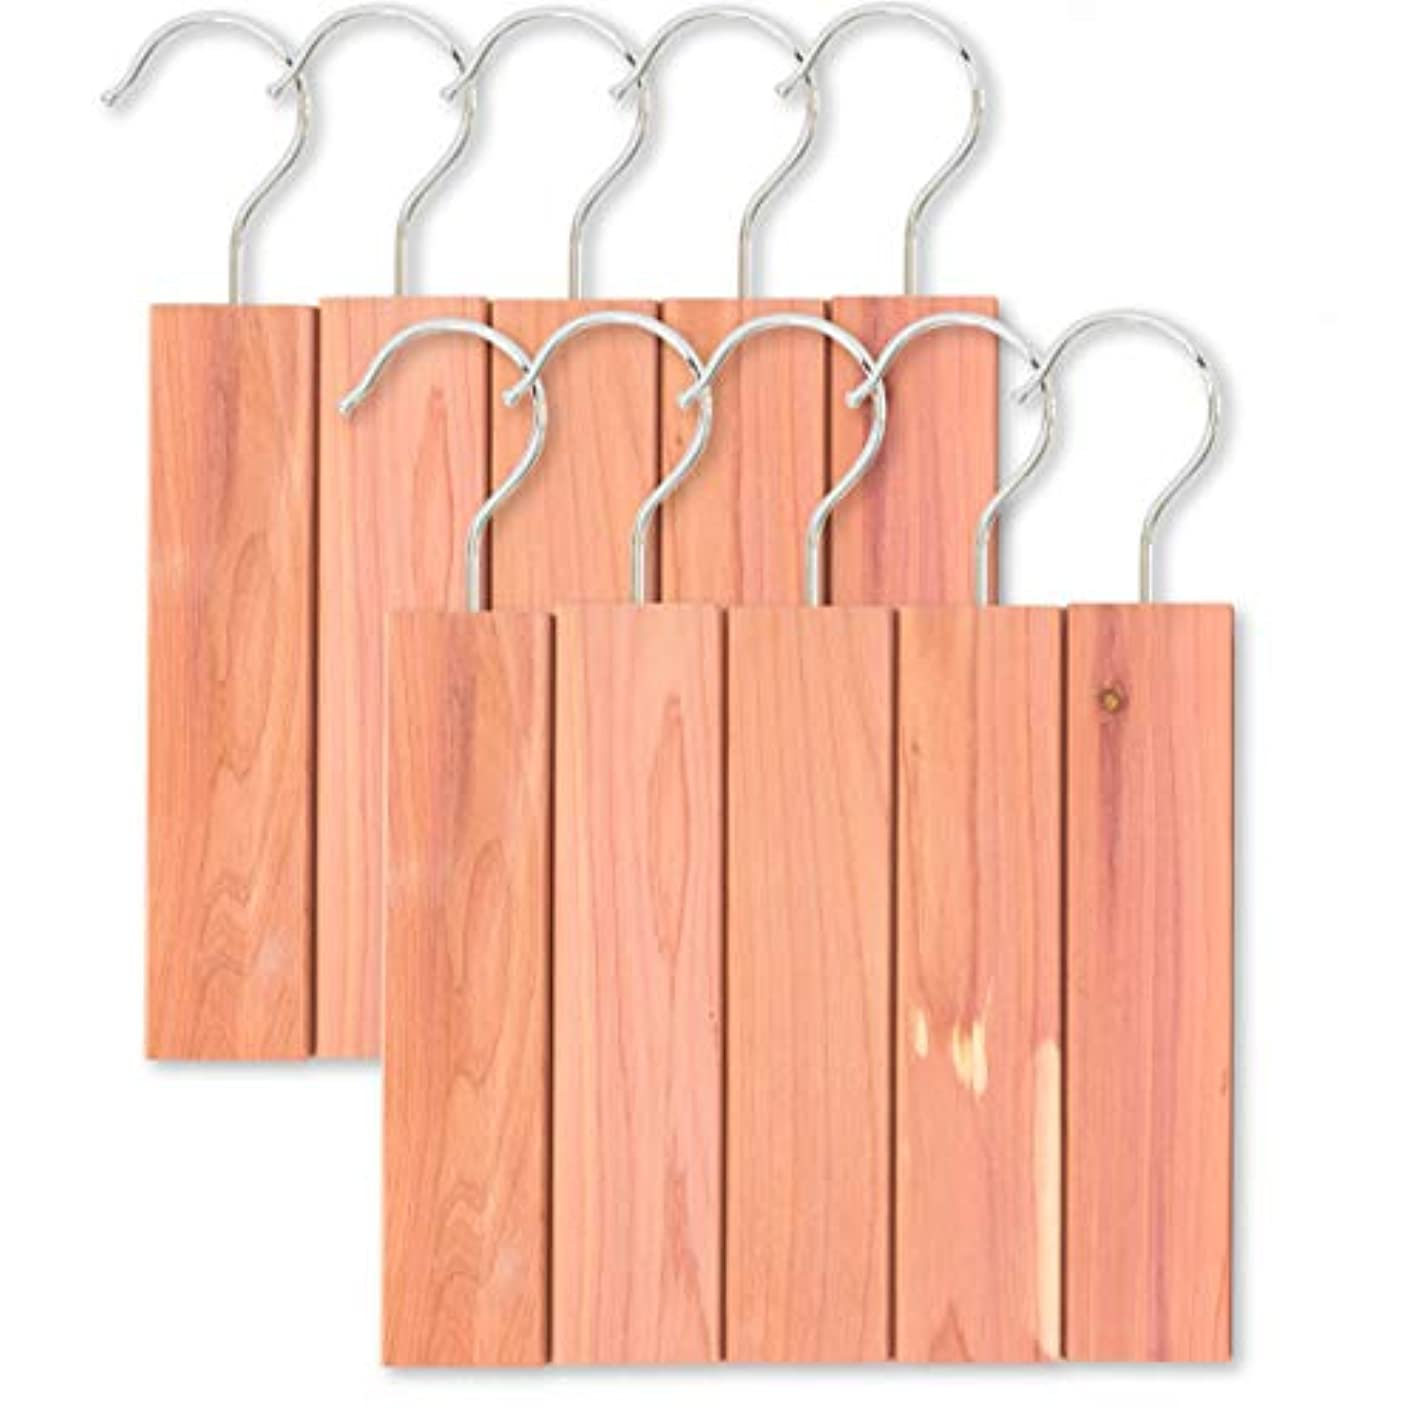 JJEcommUS Large Cedar Hang Ups Set - 10 Cedar Hangers | Cedar Blocks for Clothes Storage | 100% Natural Fragrance Deodorizer